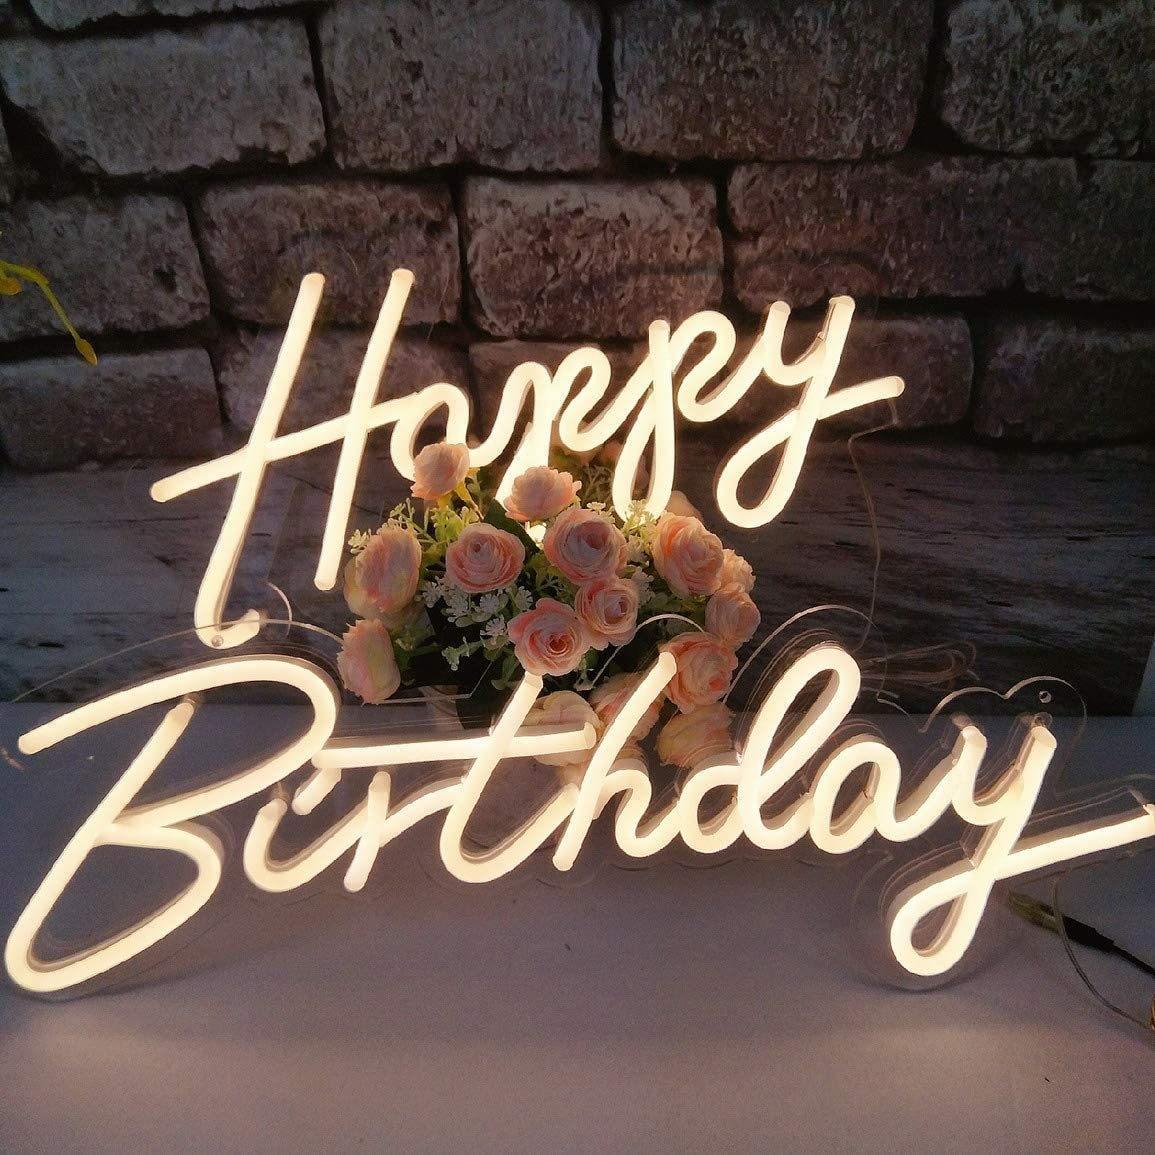 23 ''x 16 ''عيد ميلاد سعيد Led علامات ضوئية النيون لشريط حانة نادي المنزل حفل زفاف مطعم ديكور داخلي جدار معلق ضوء النيون